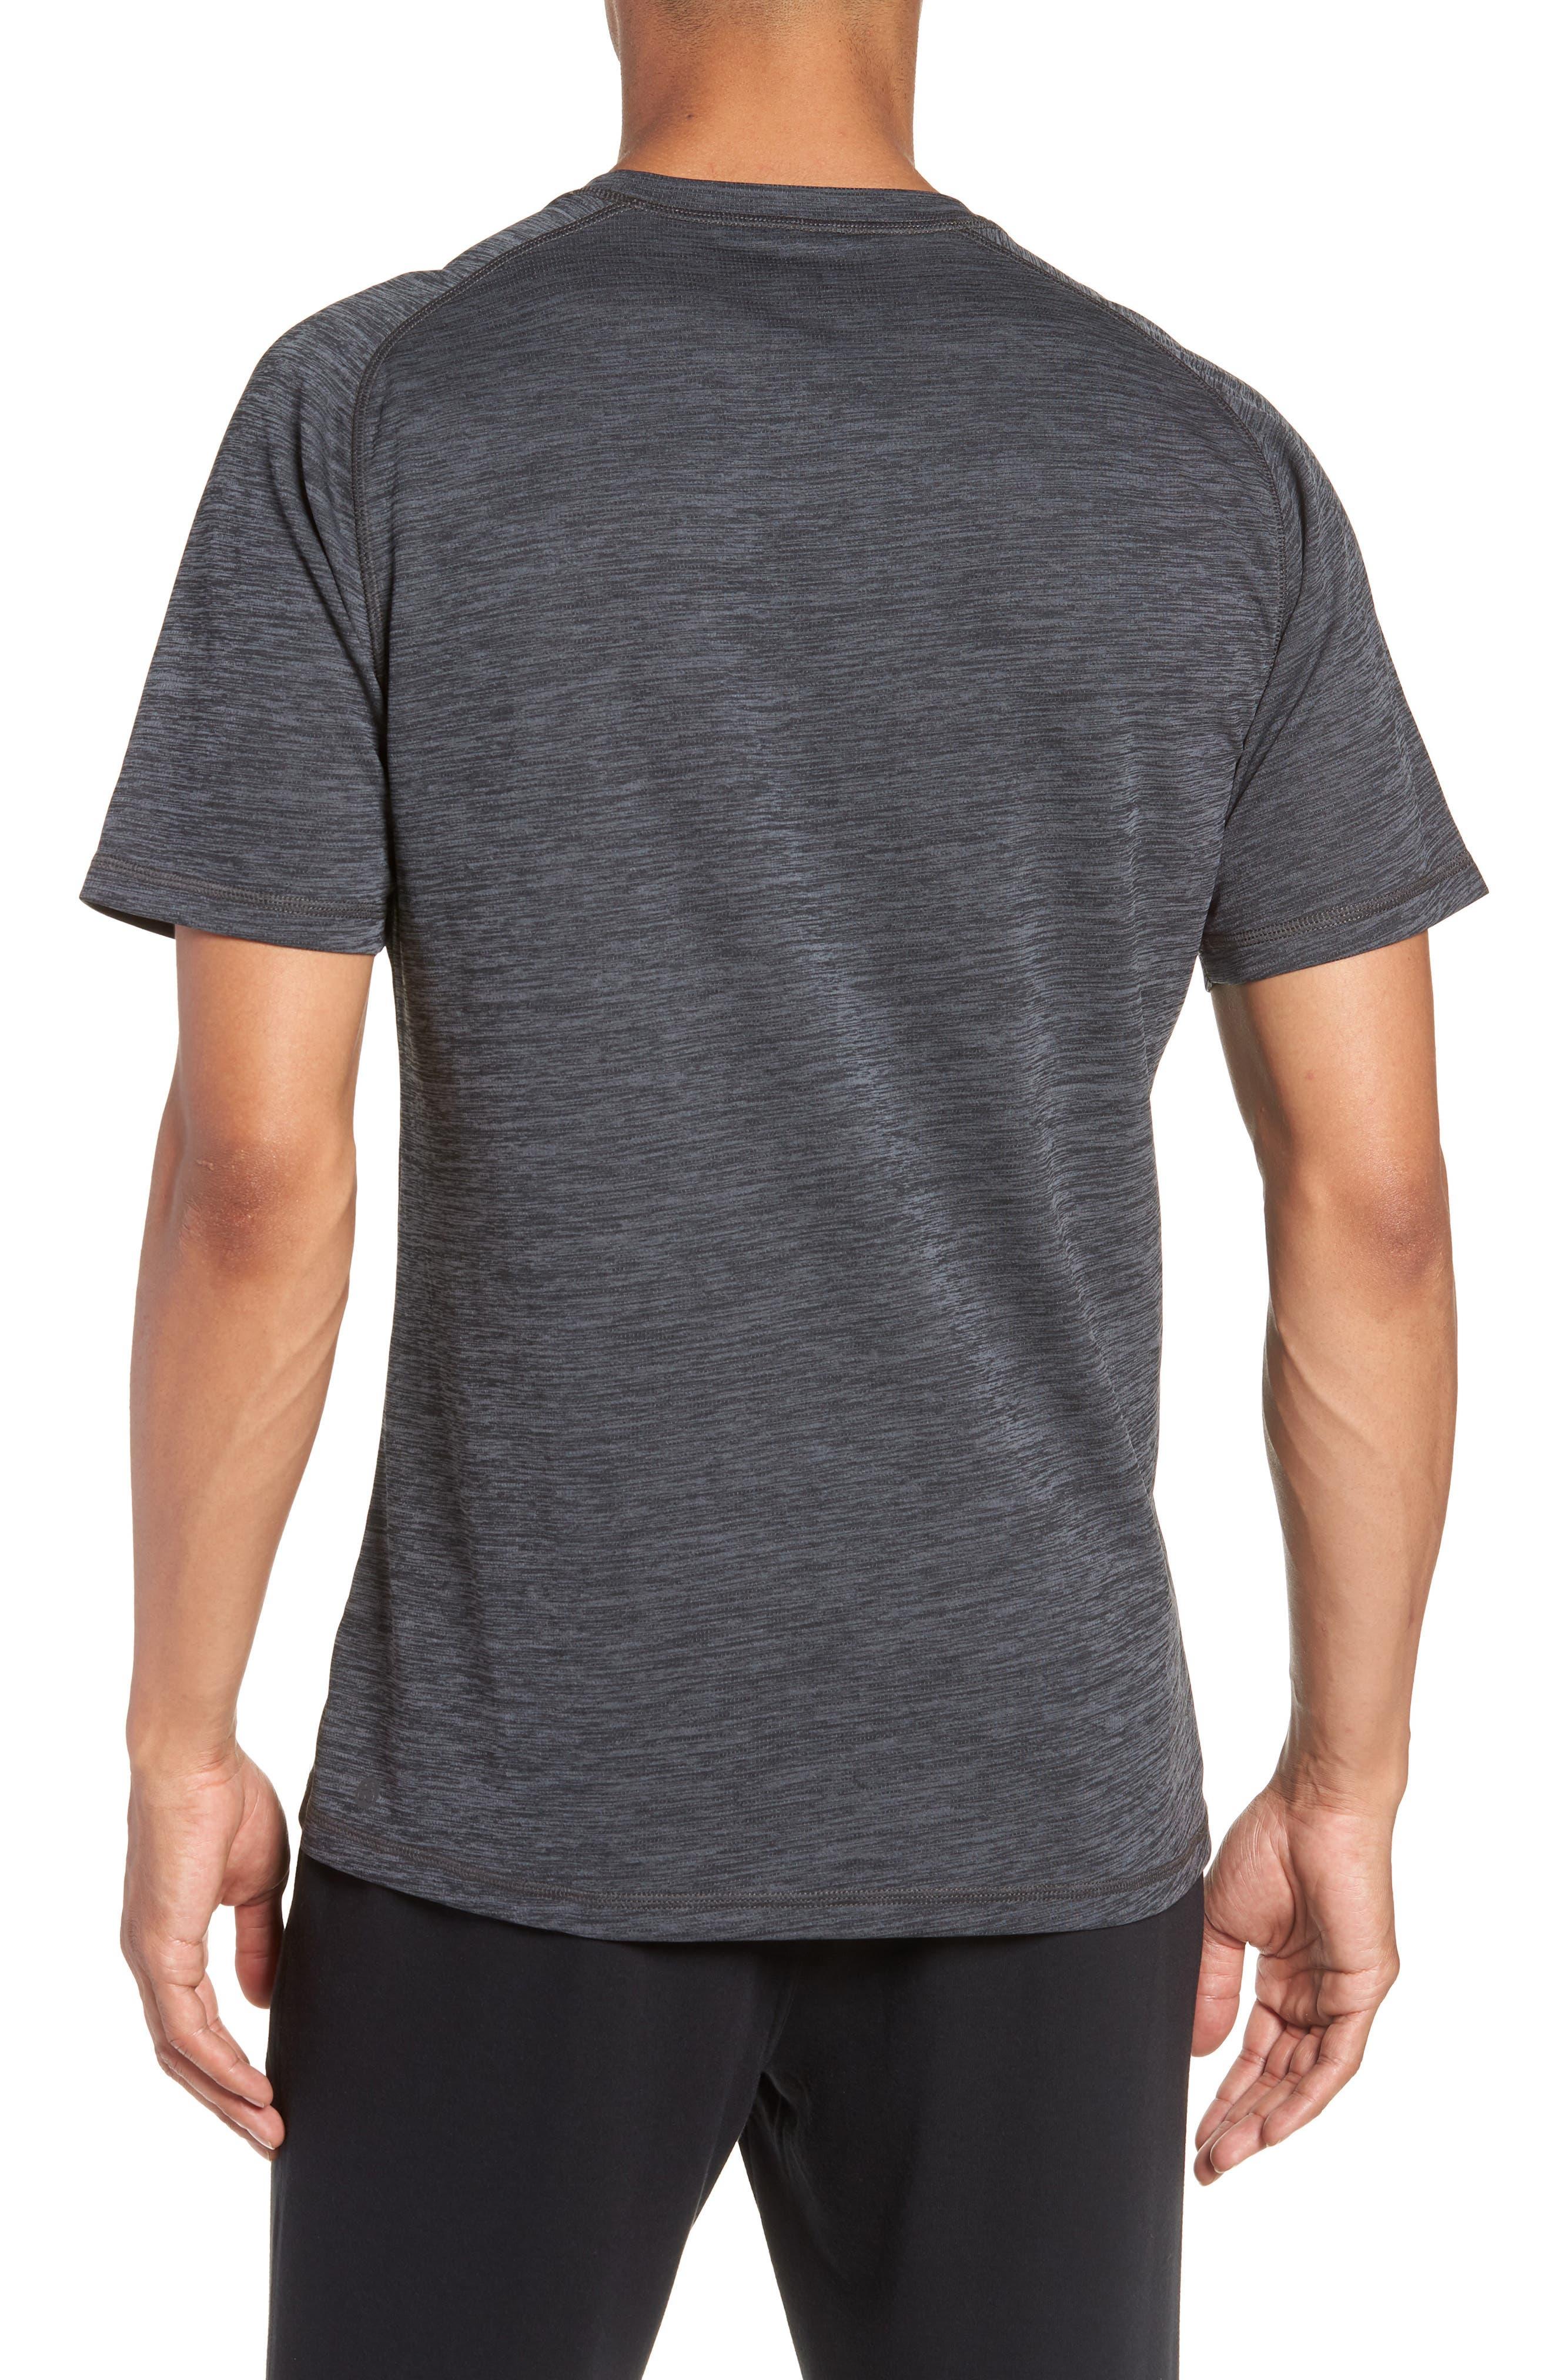 Kinoite Raglan Crewneck T-Shirt,                             Alternate thumbnail 2, color,                             GREY OBSIDIAN MELANGE